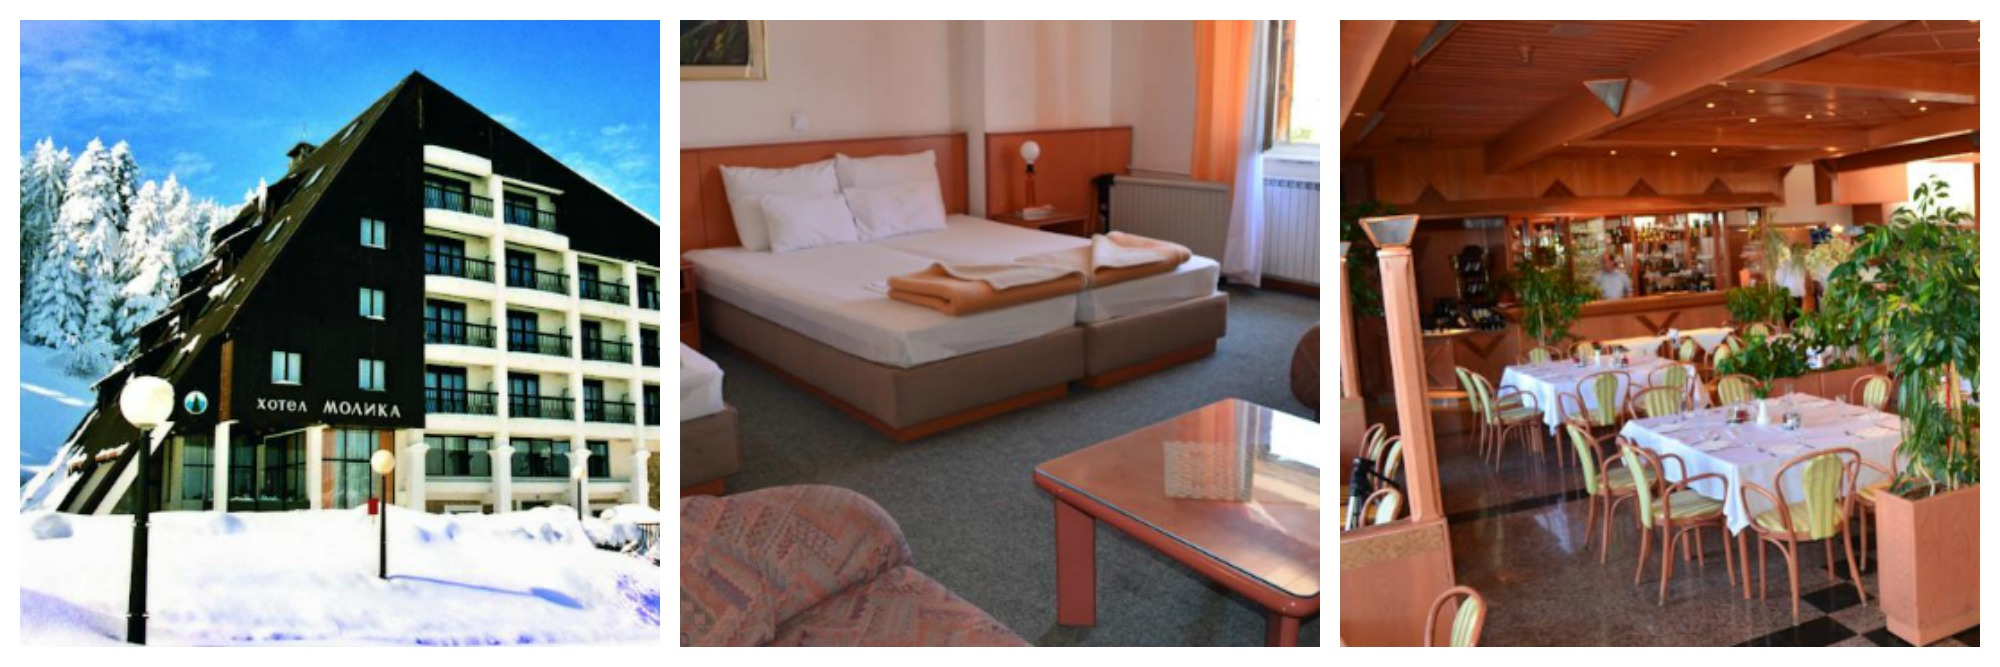 molika-hotel